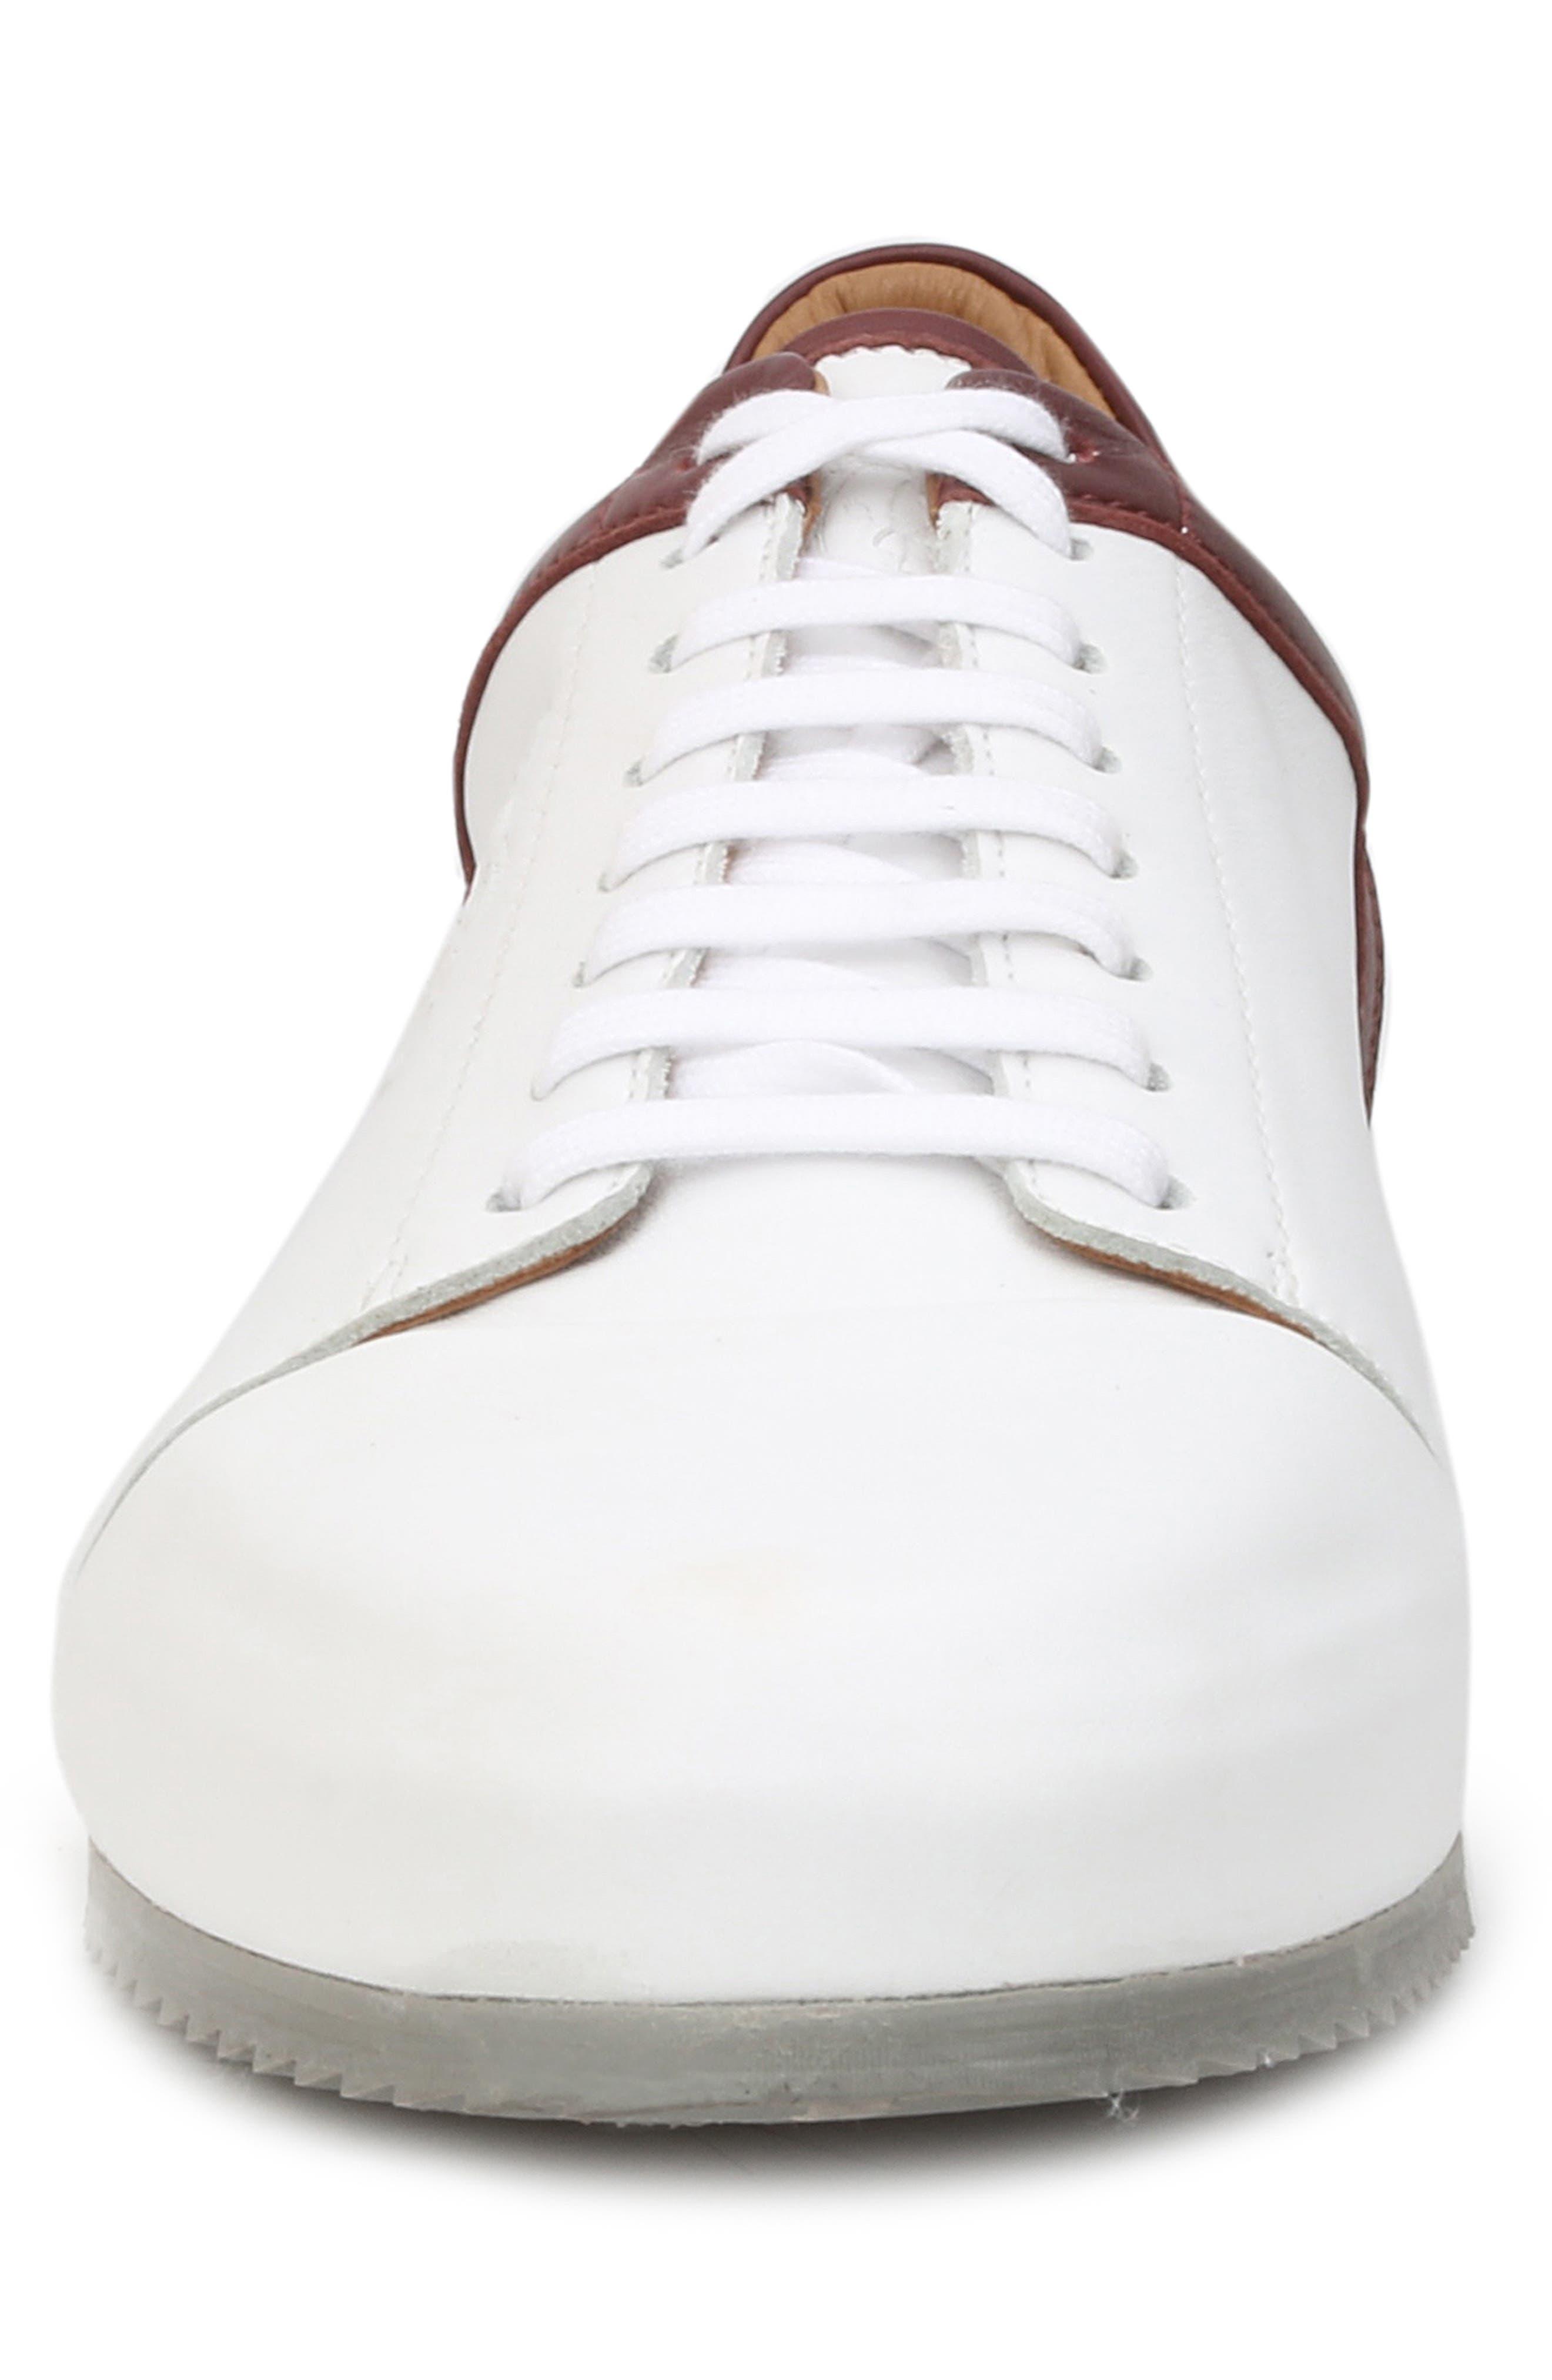 Santana Sneaker,                             Alternate thumbnail 4, color,                             WHITE/ BORDEAUX